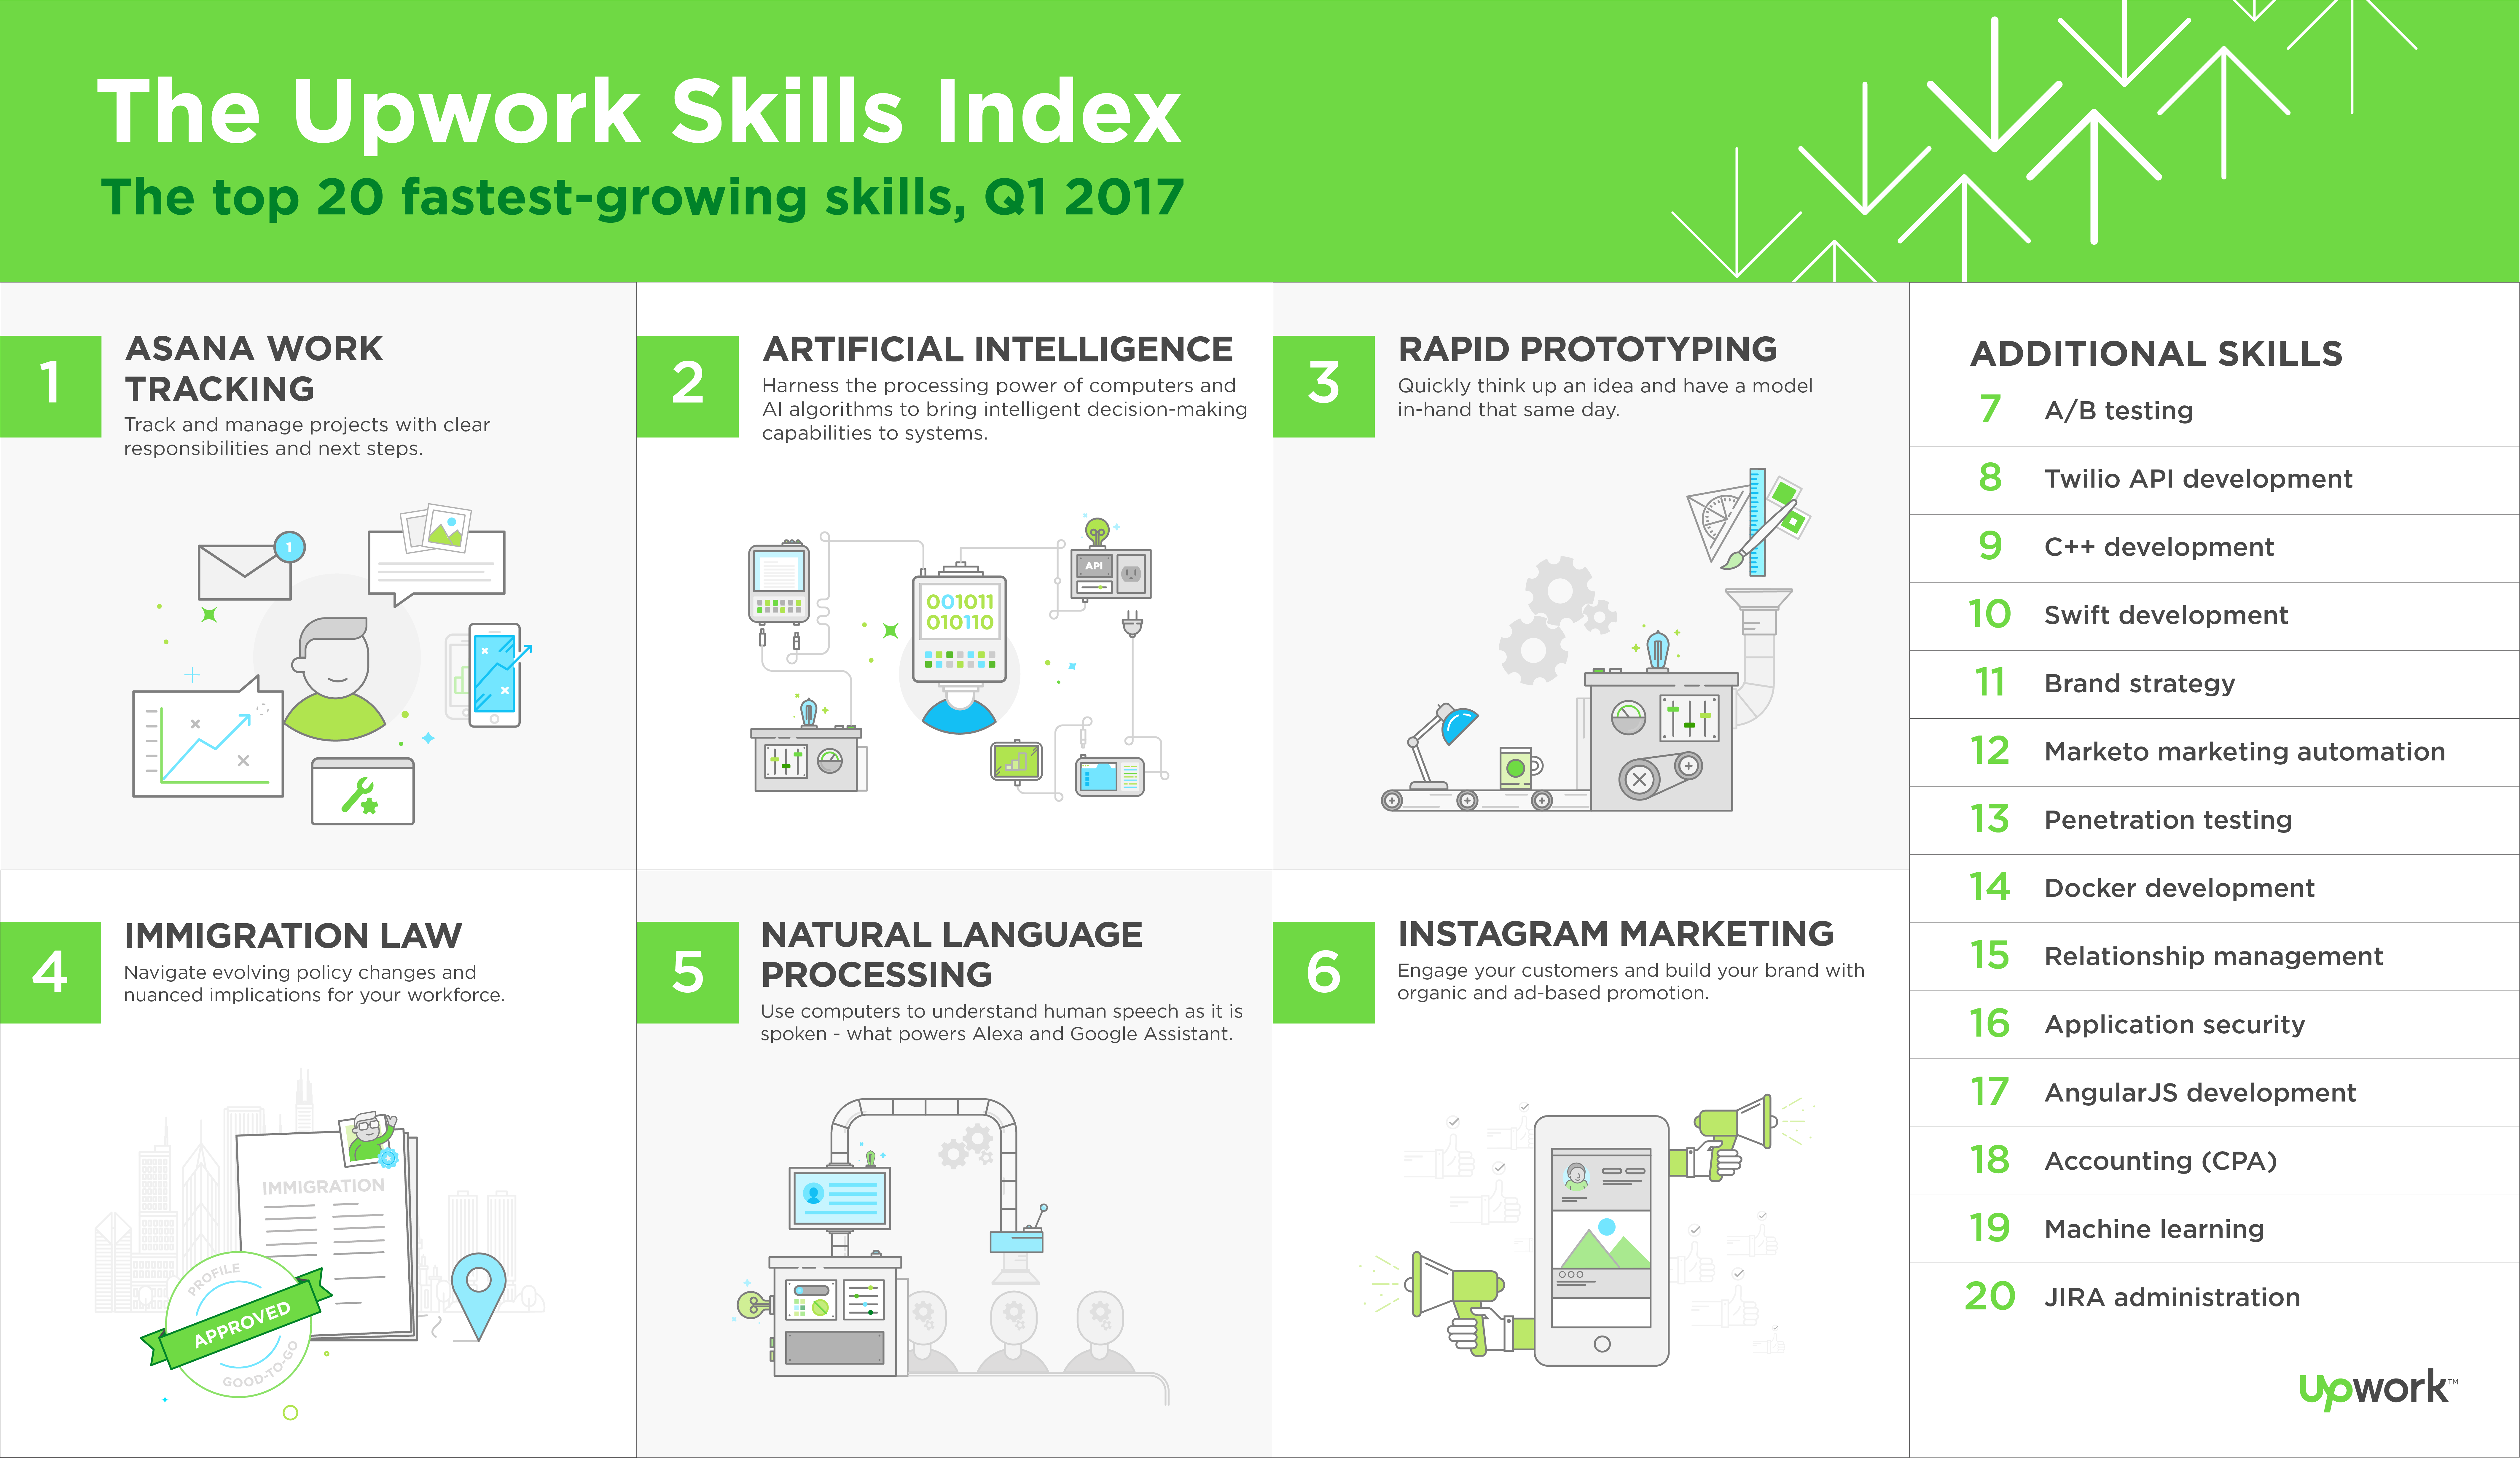 FINAL_Q1-2017-Upwork-Skills-Index-Infographic.png